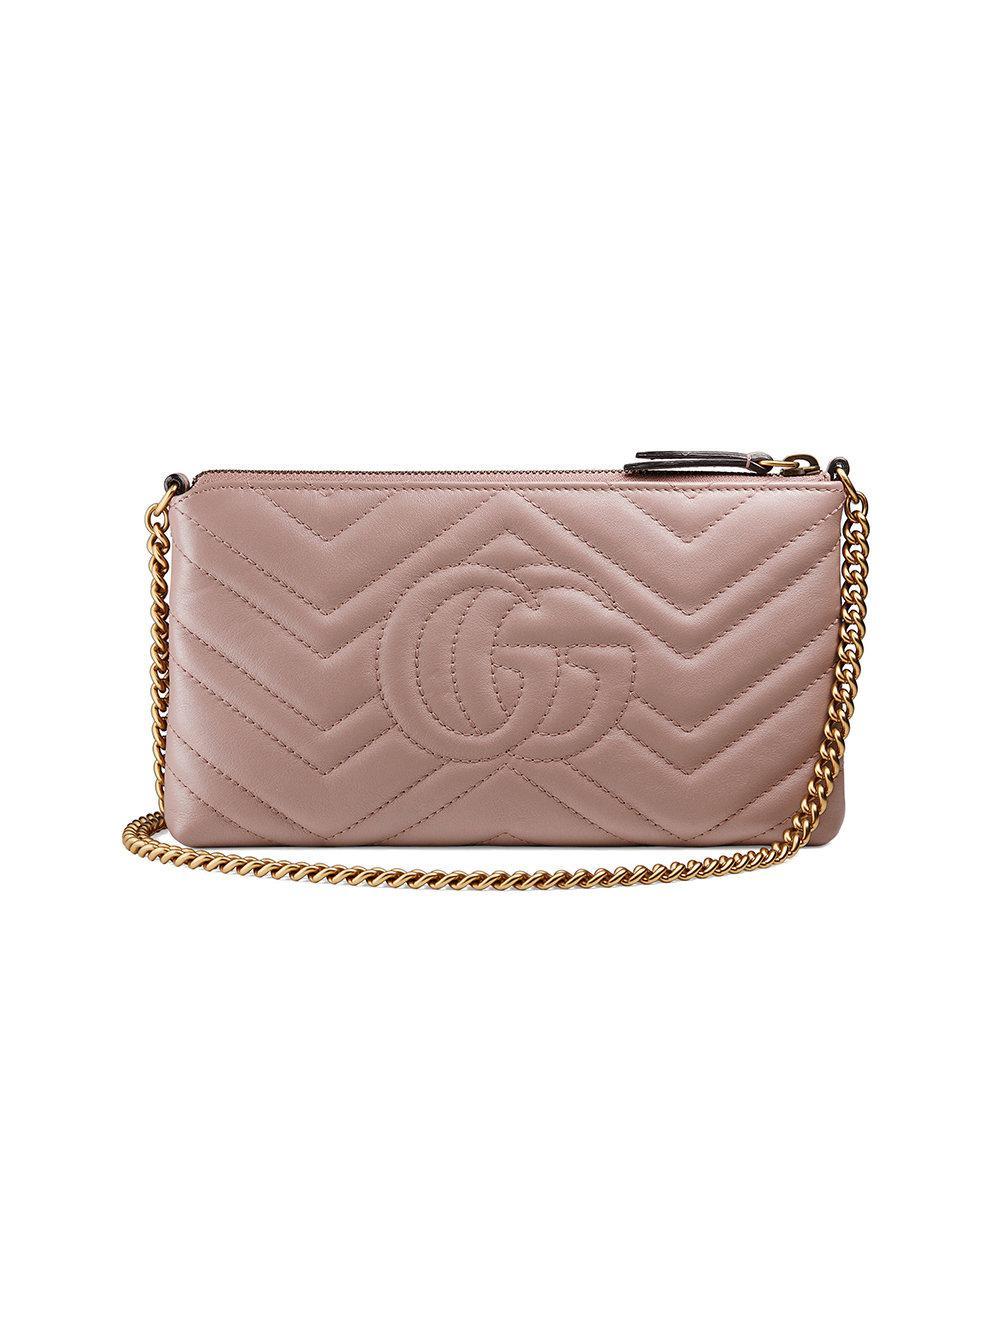 Gucci - GG Marmont Pearls & Studs Matelassé Shoulder Bag Nude   Luxury Bags